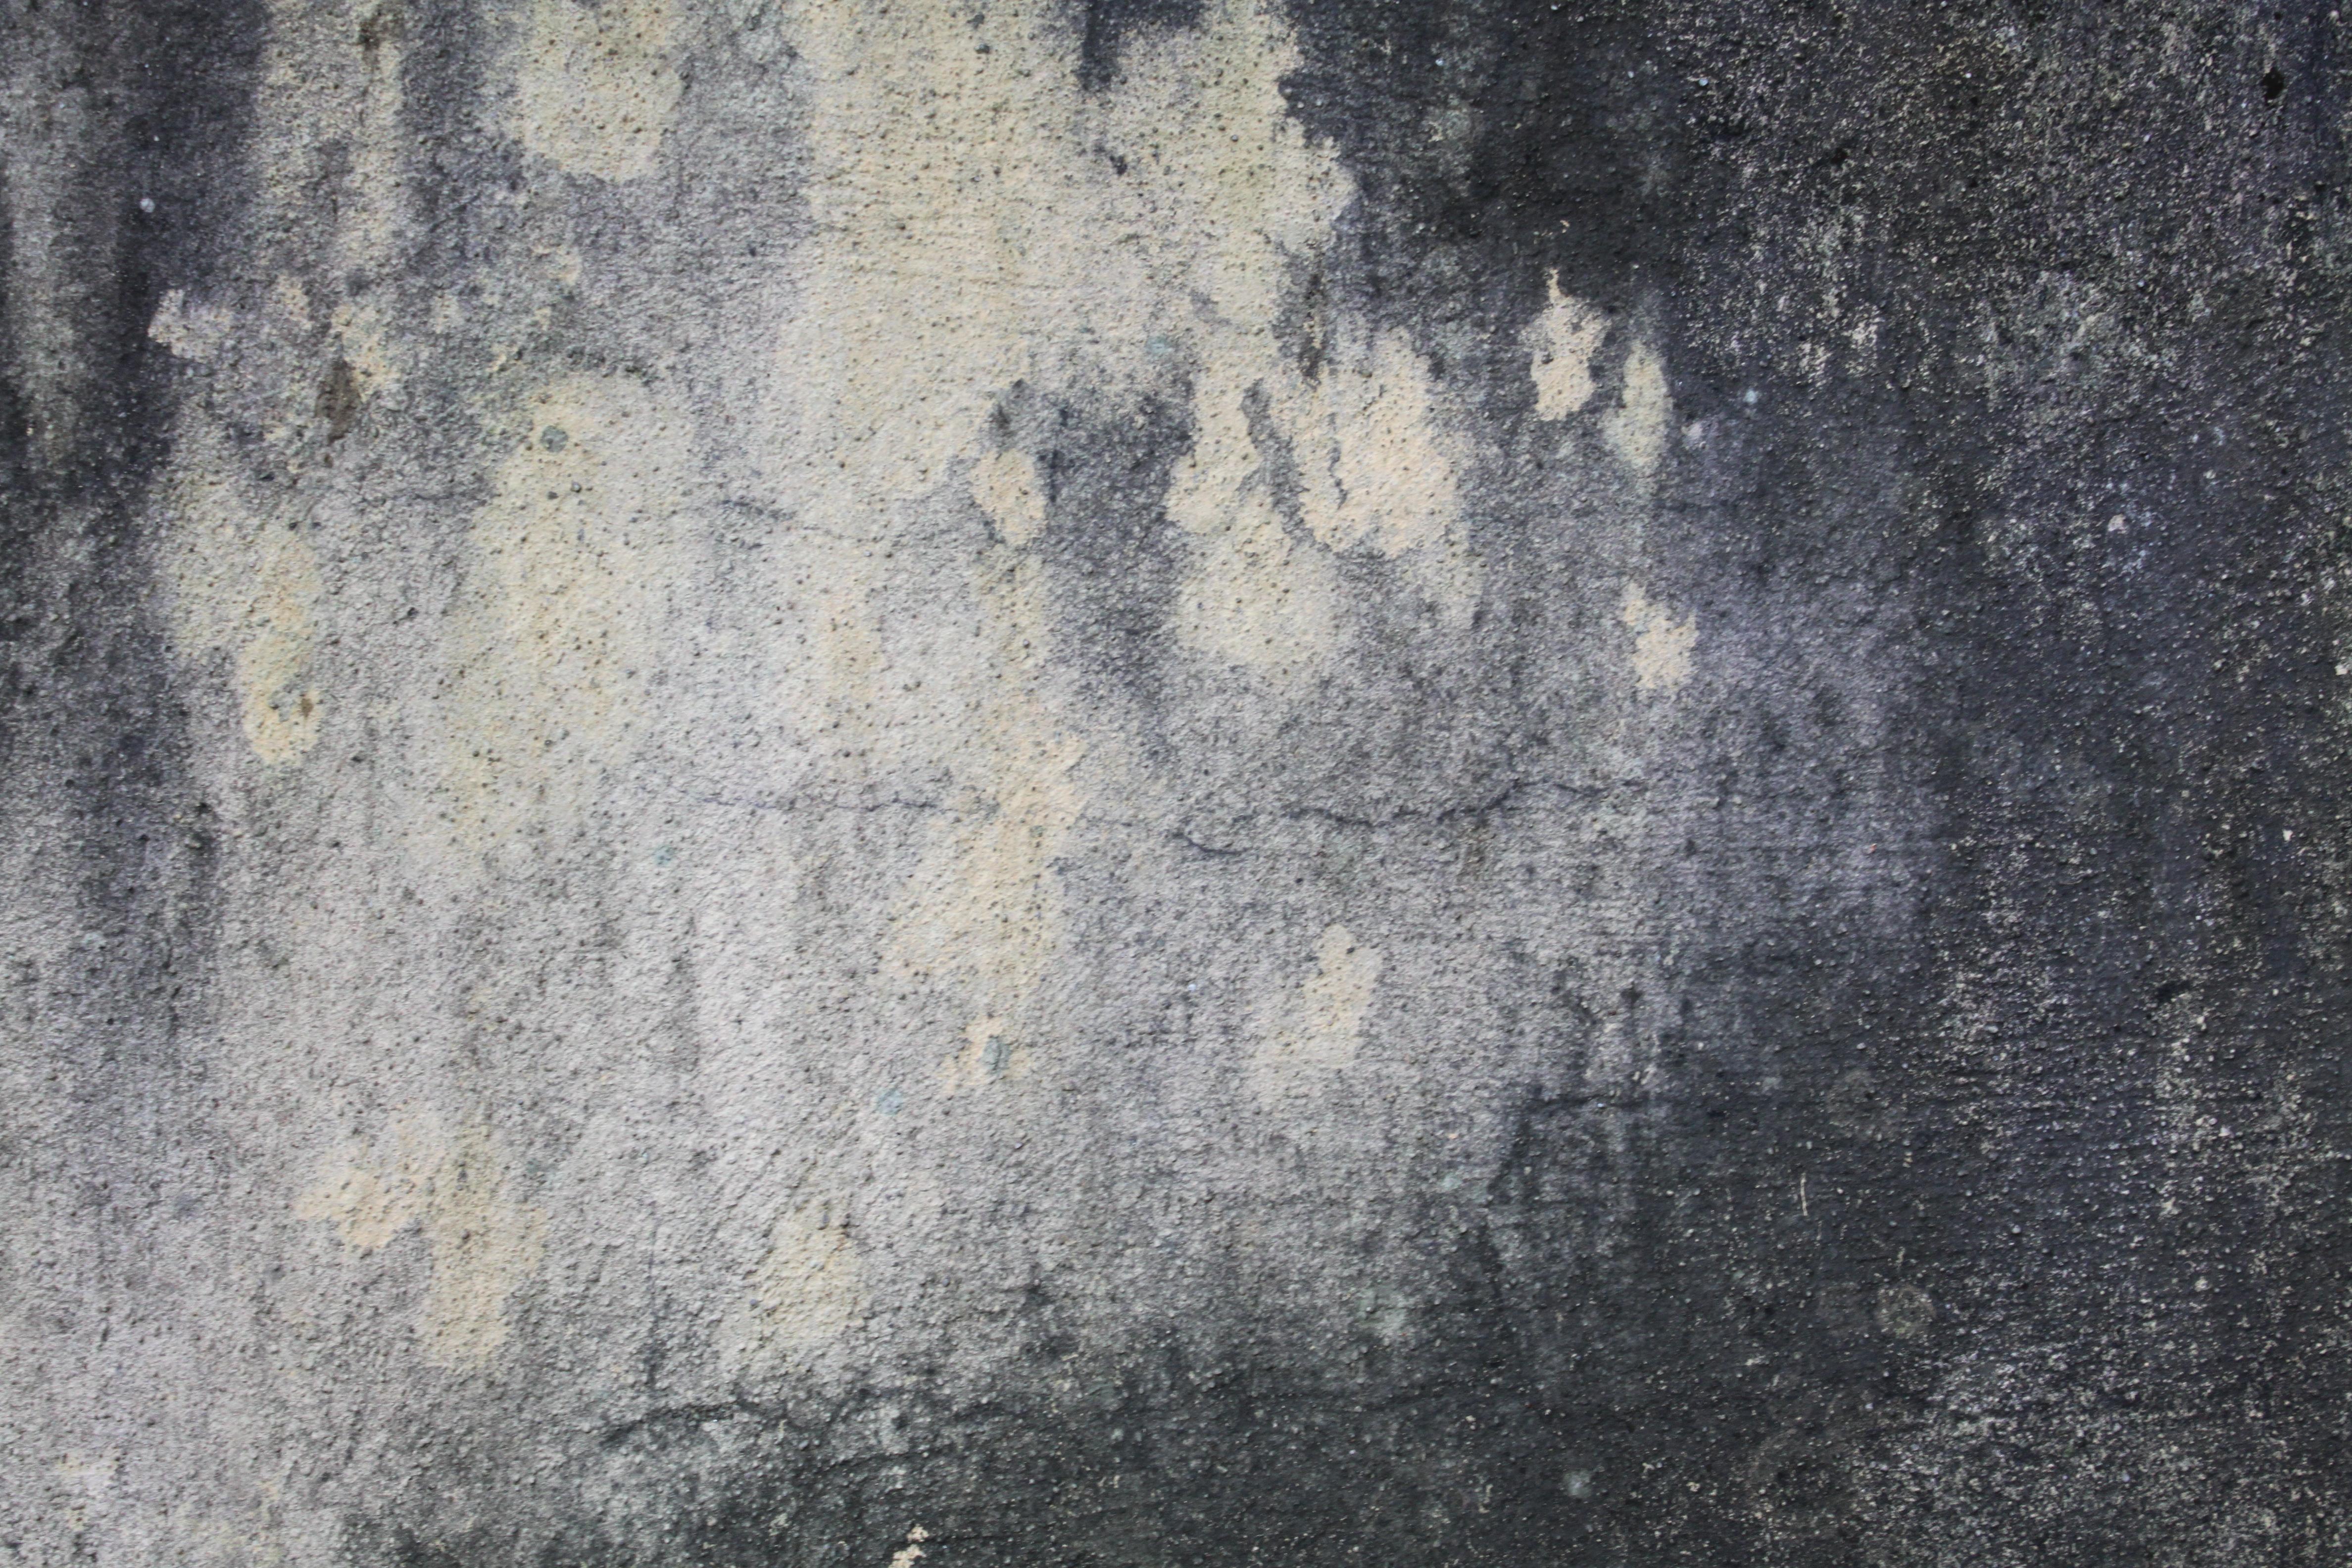 Grunge Wall HD Desktop Wallpaper, Instagram photo, Background Image ...